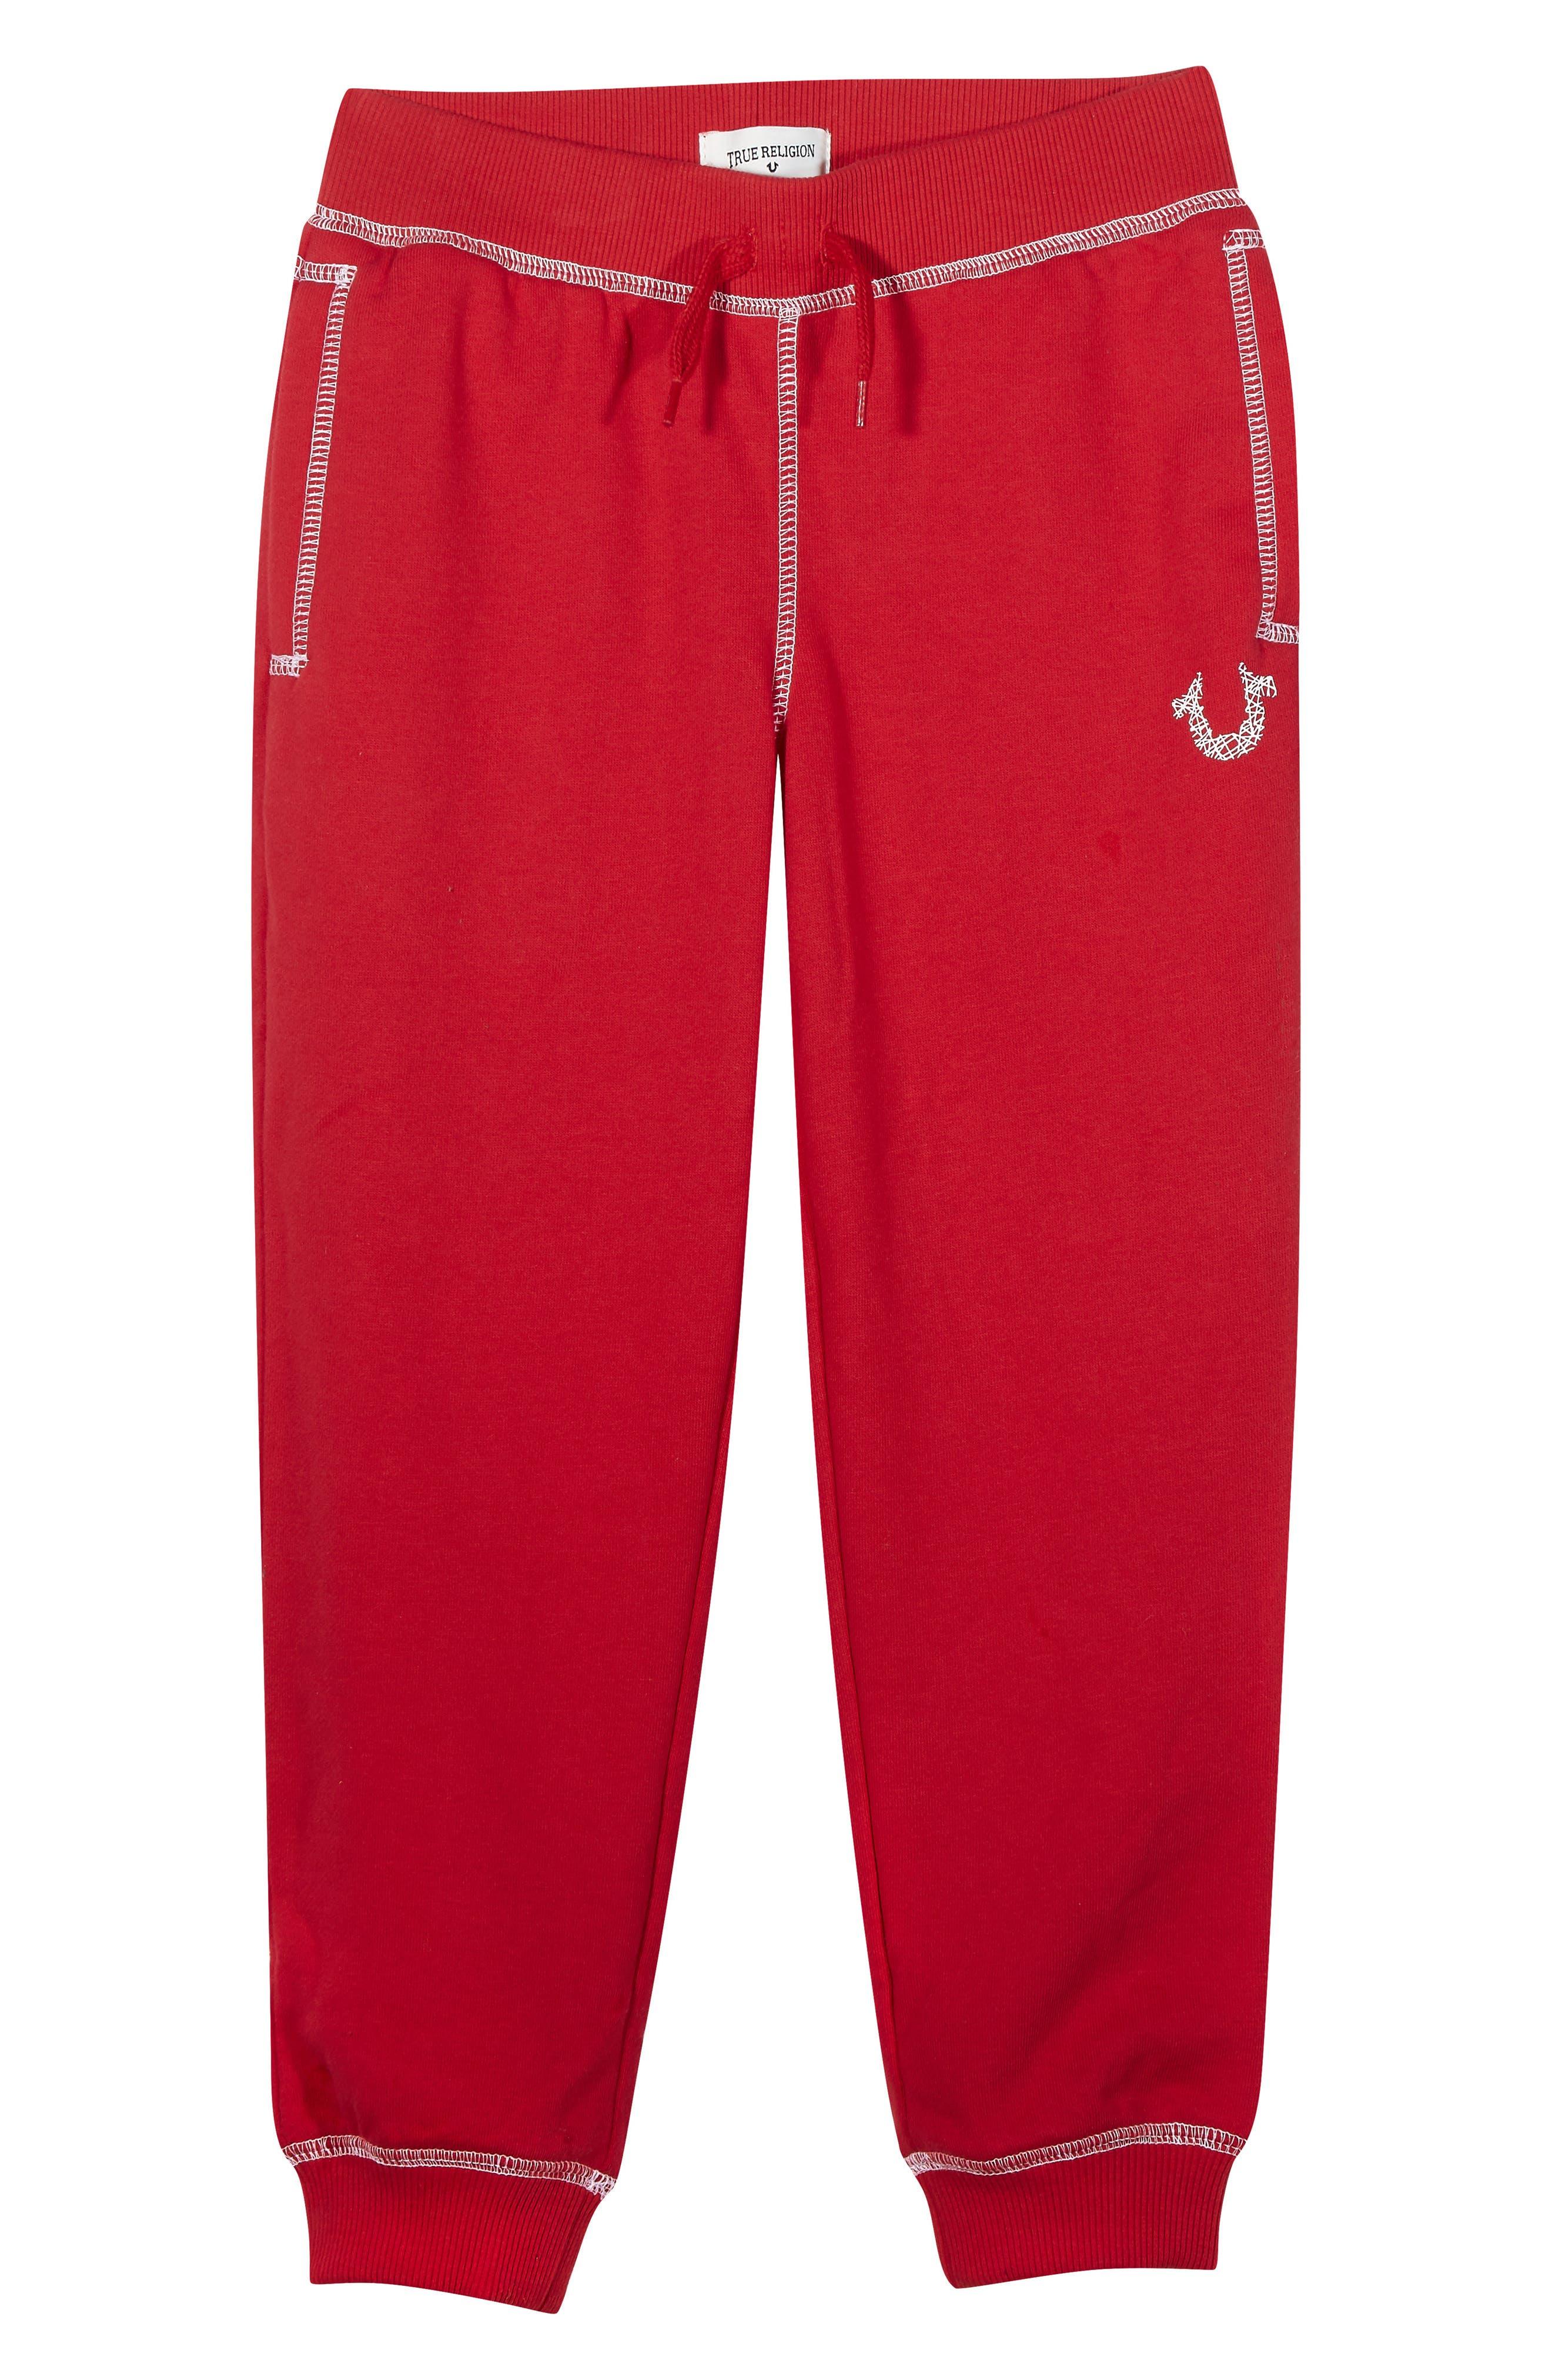 True Religion Brand Jeans Shoestring Sweatpants (Toddler Boys & Little Boys)